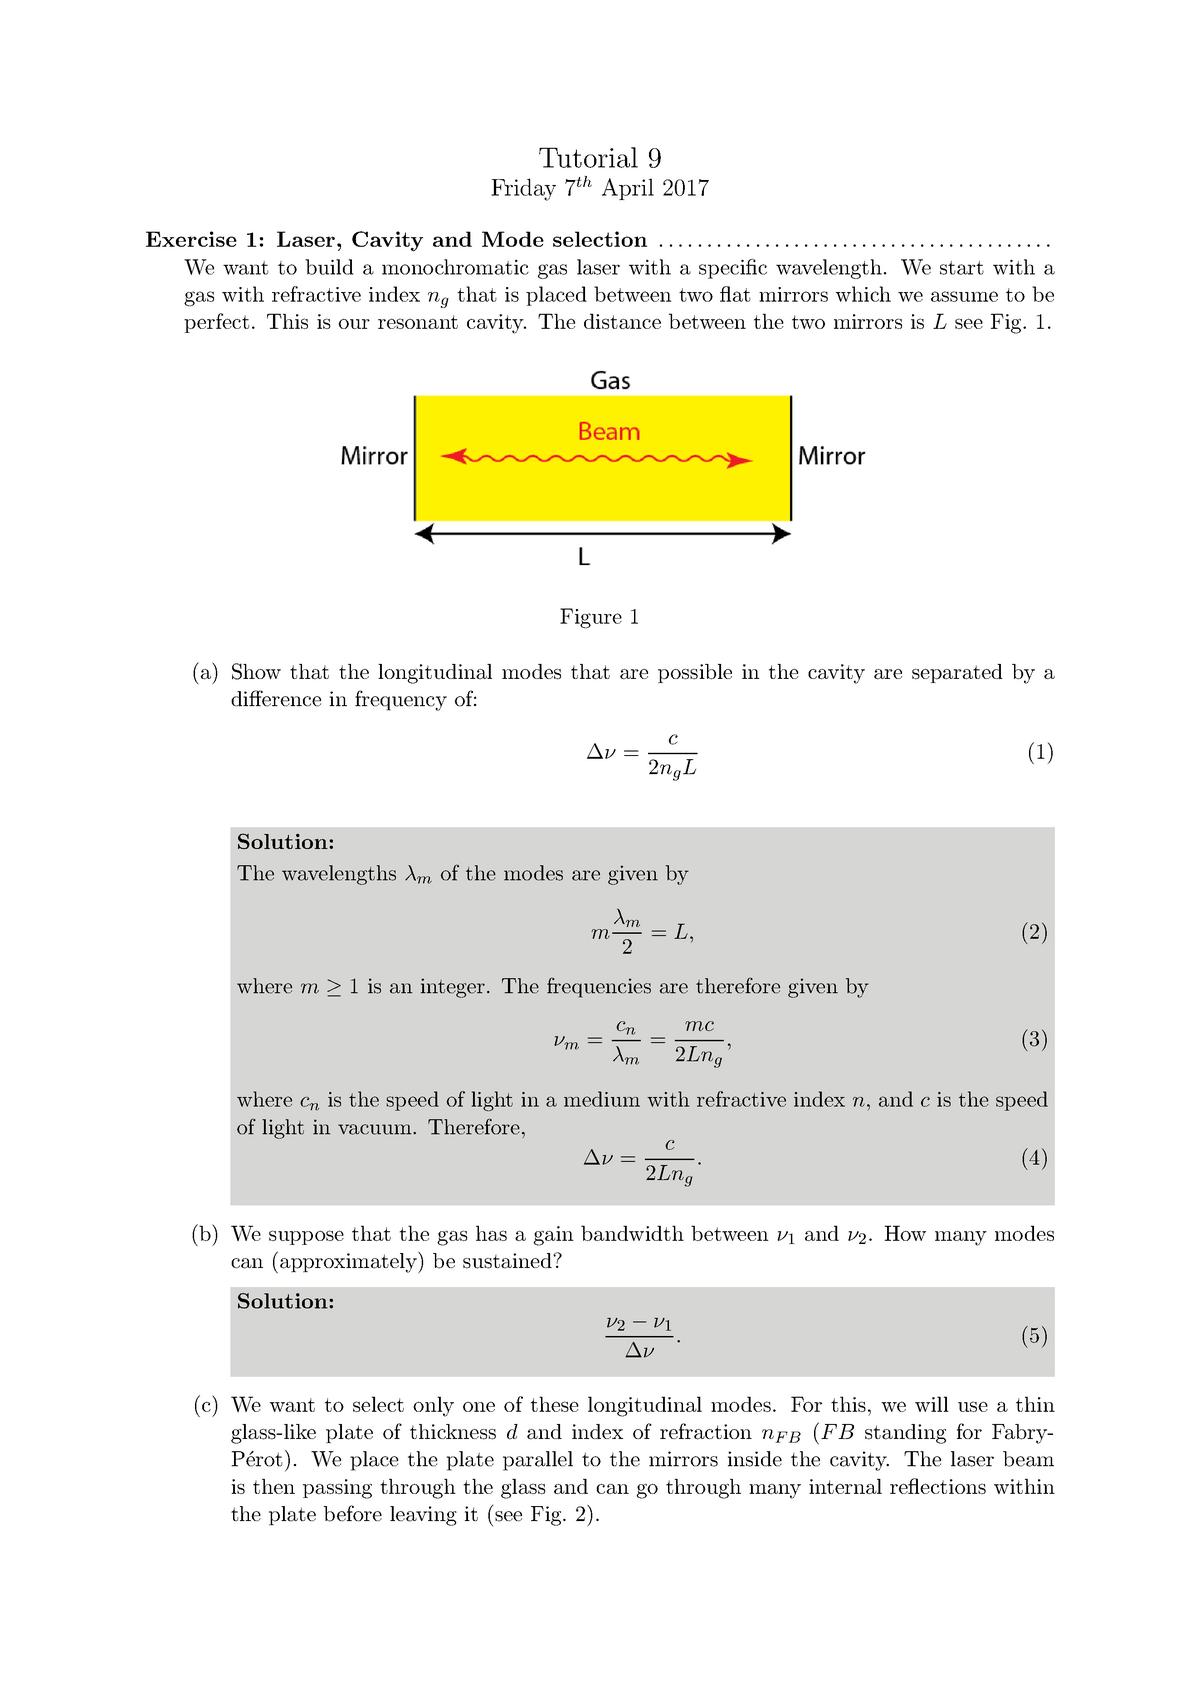 Tutorial 9 Solutions - TN2421: Optica - StuDocu